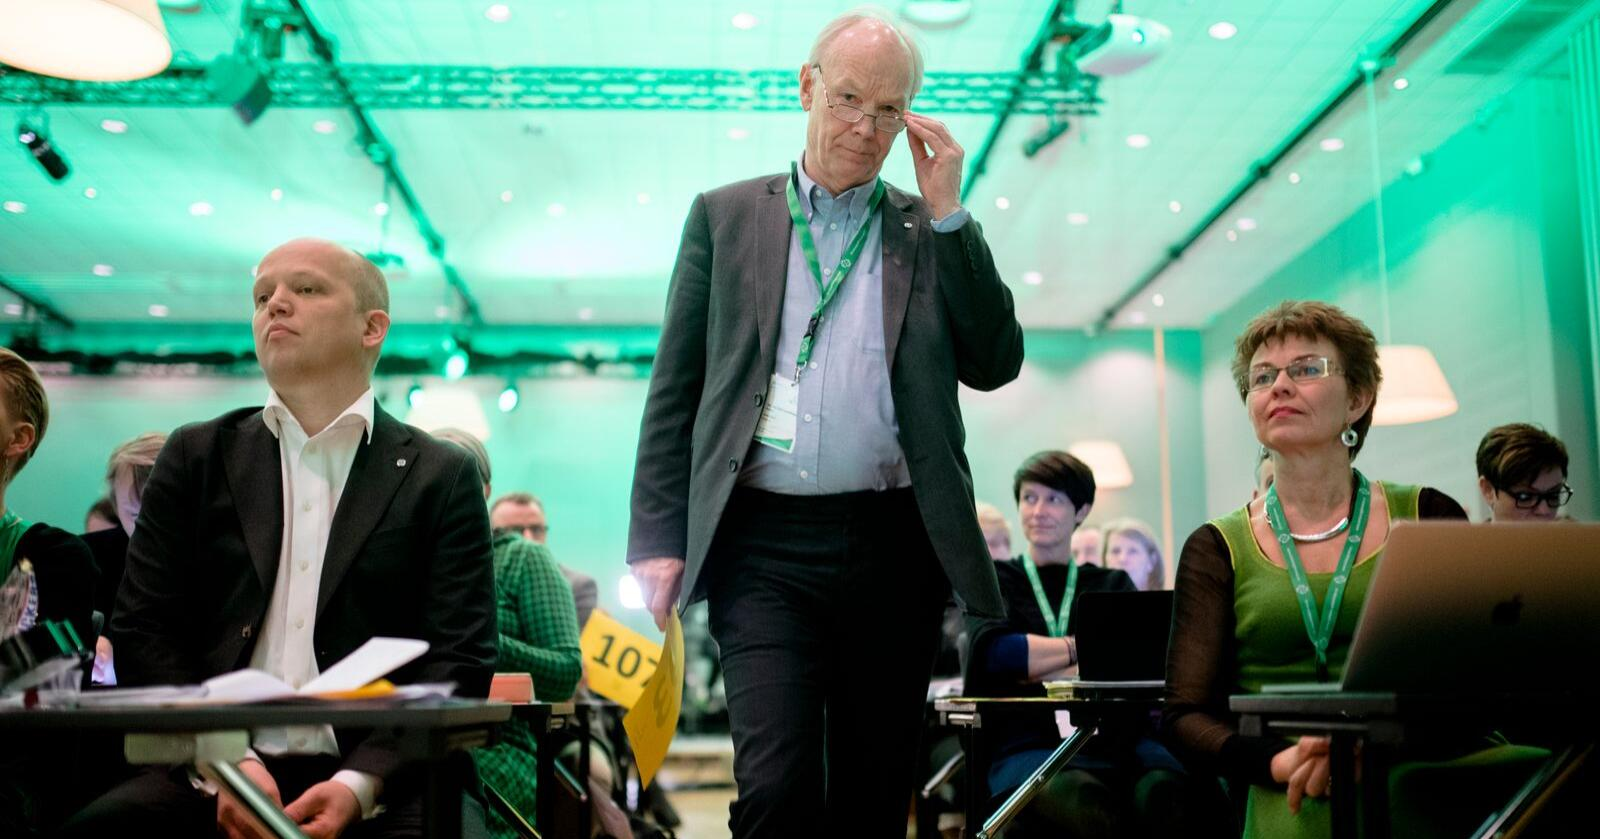 Per Olaf Lundteigen husker godt sist Senterpartiet satt i regjering. Foto: Ole Martin Wold/ NTB